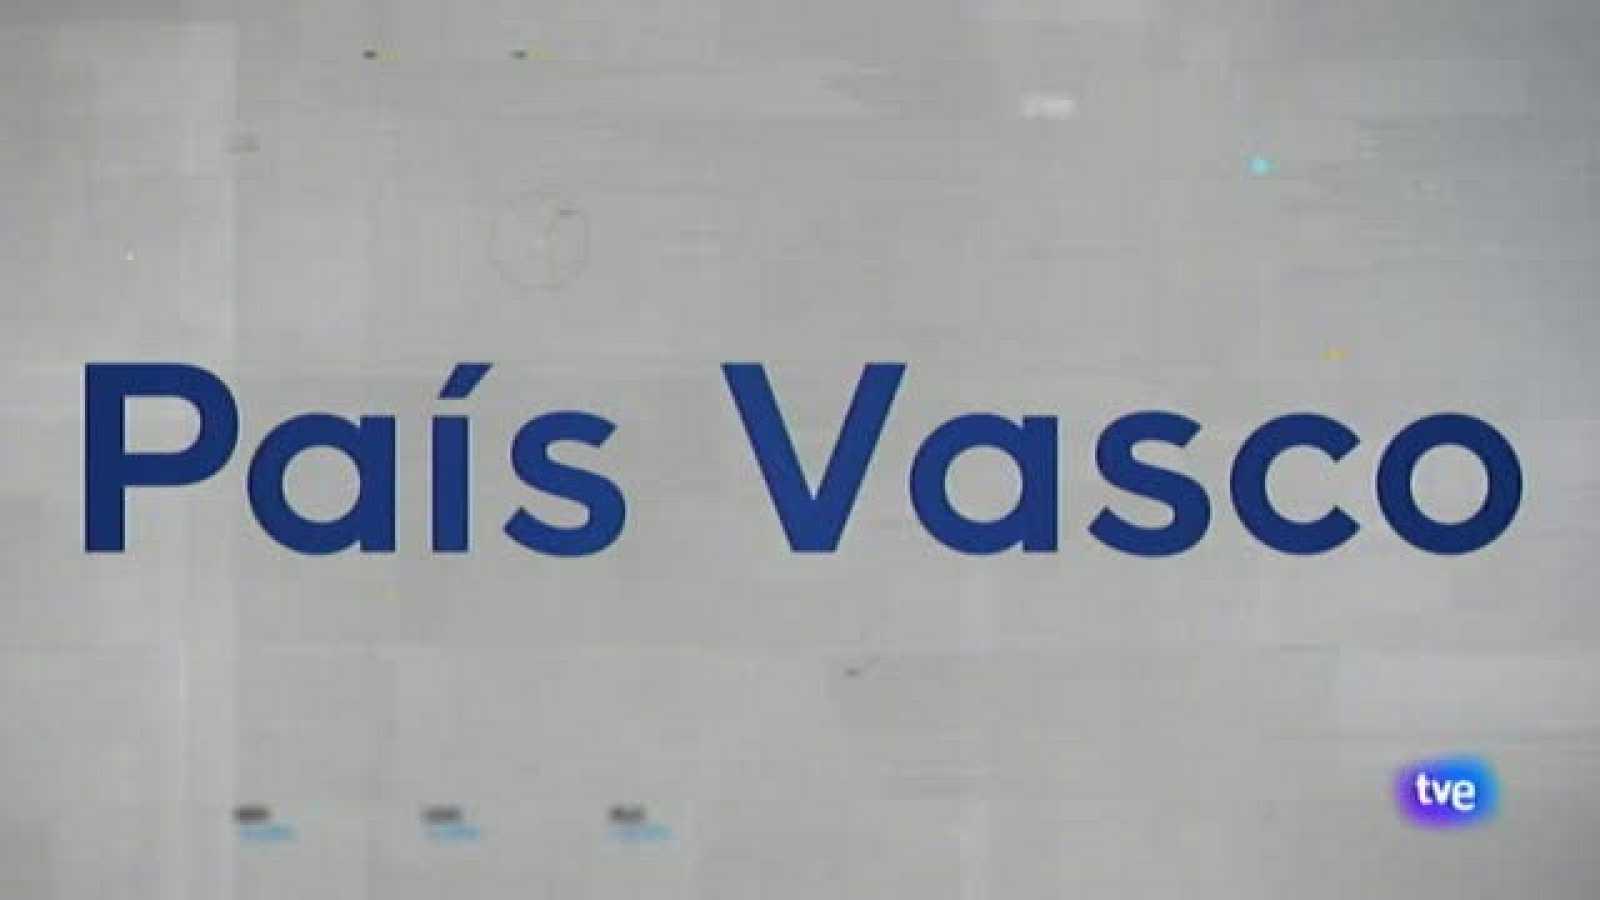 Telenorte País Vasco 15/05/21